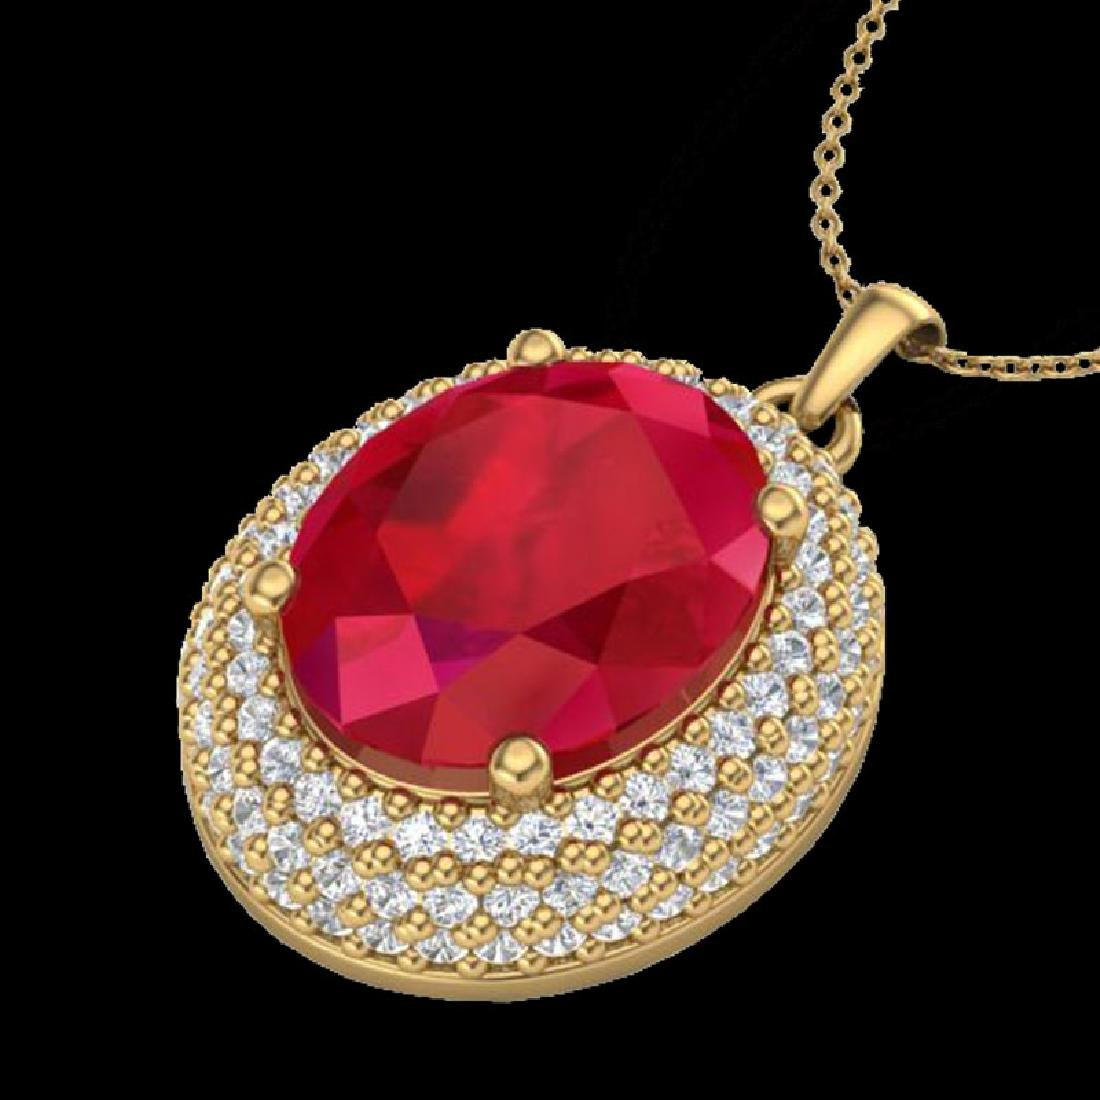 4.50 CTW Ruby & Micro Pave VS/SI Diamond Necklace 18K - 2